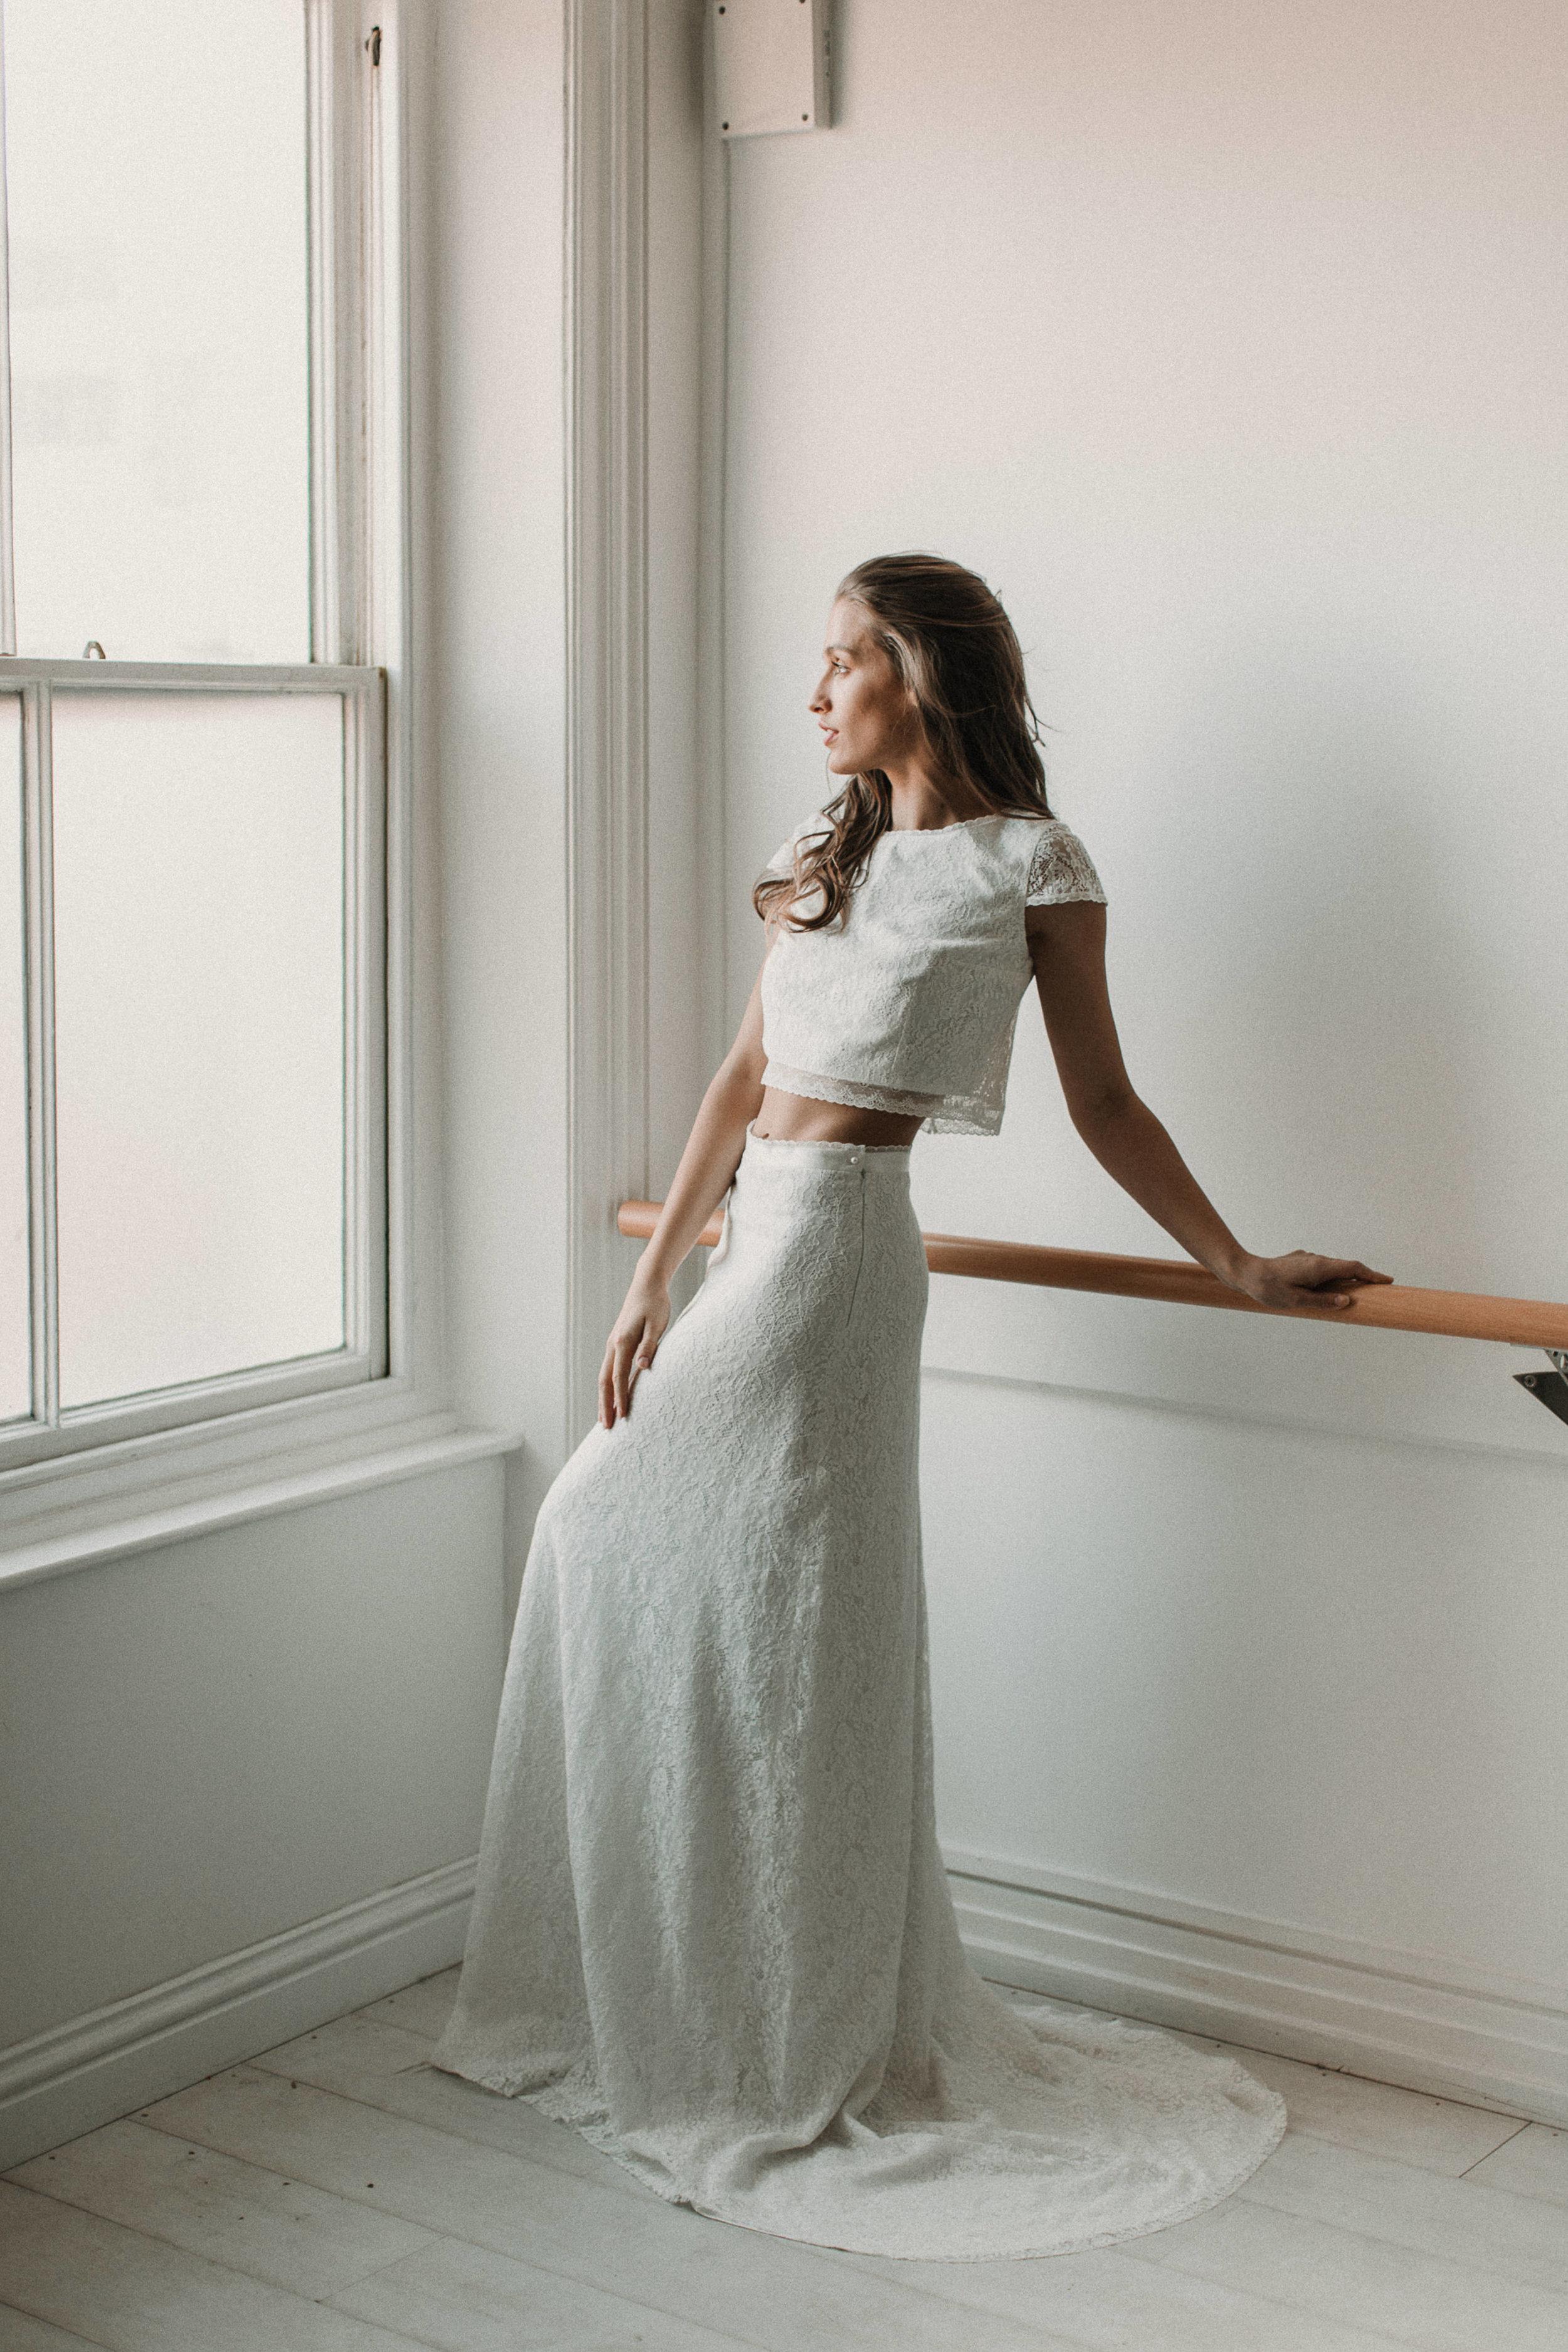 npluck_luna_bride-2.jpg